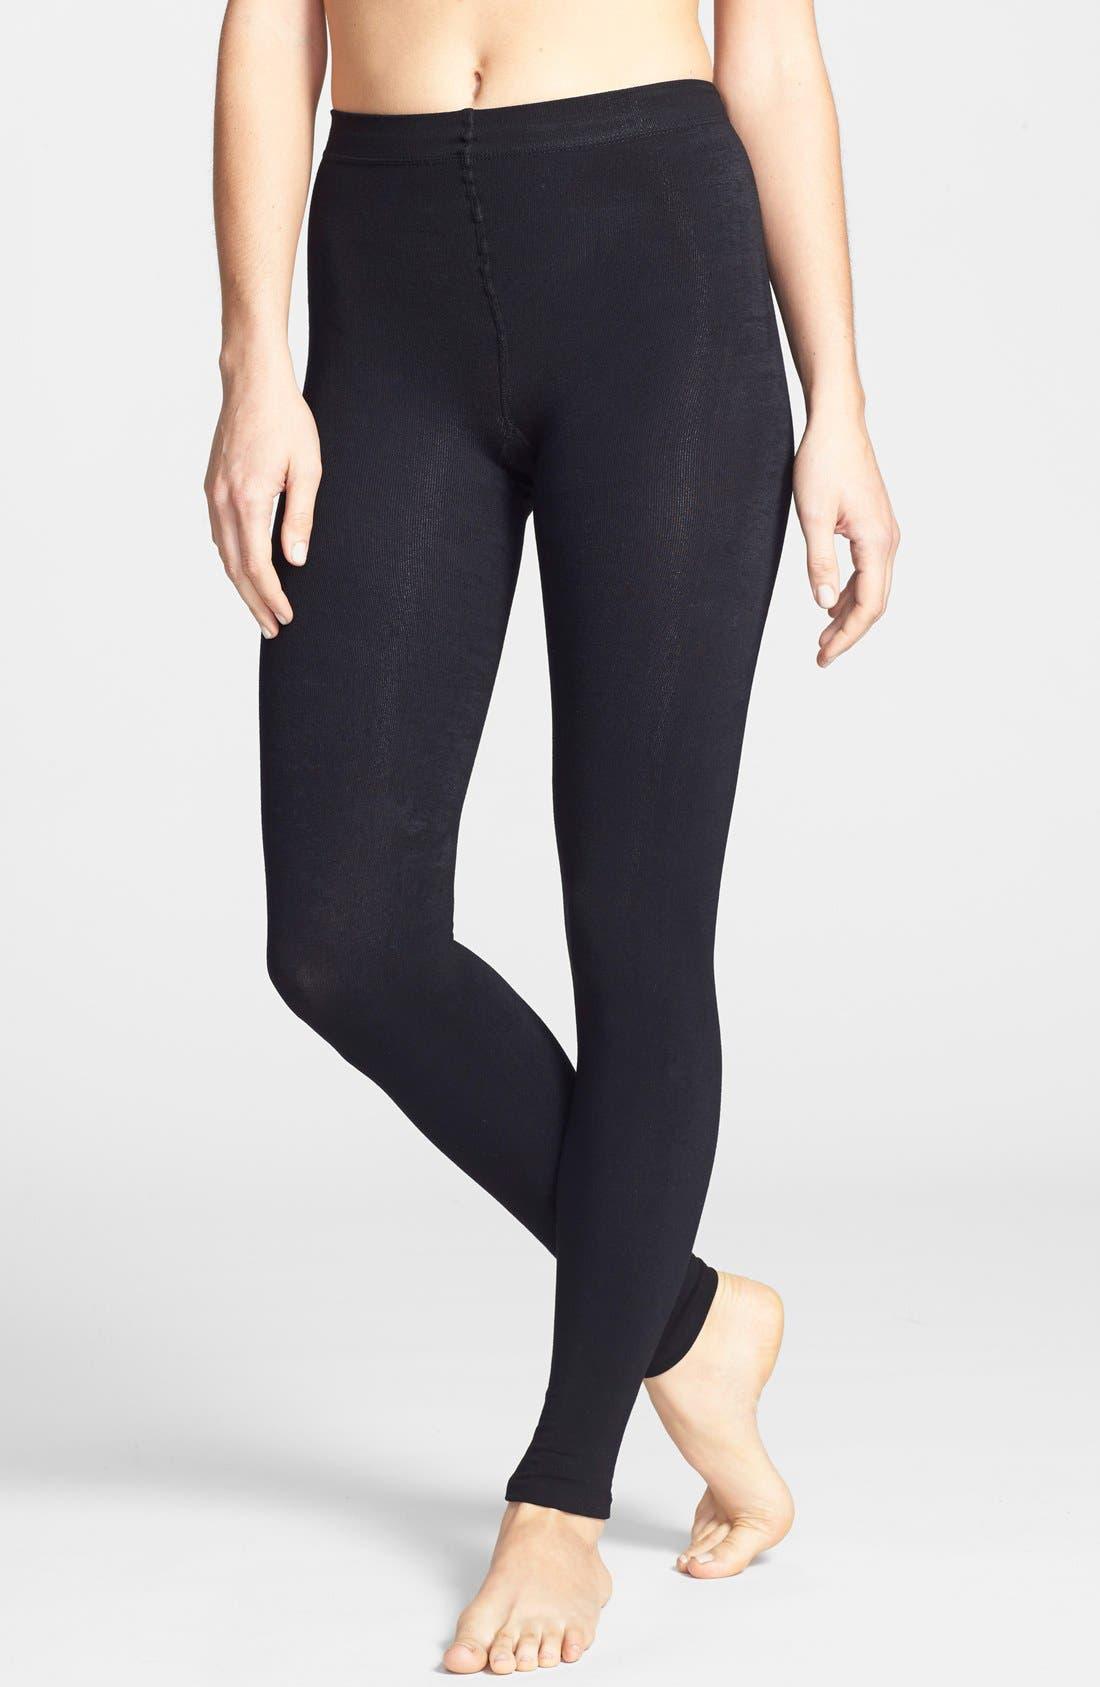 Donna Karan 'Luxe Layer' Leggings,                         Main,                         color, 003